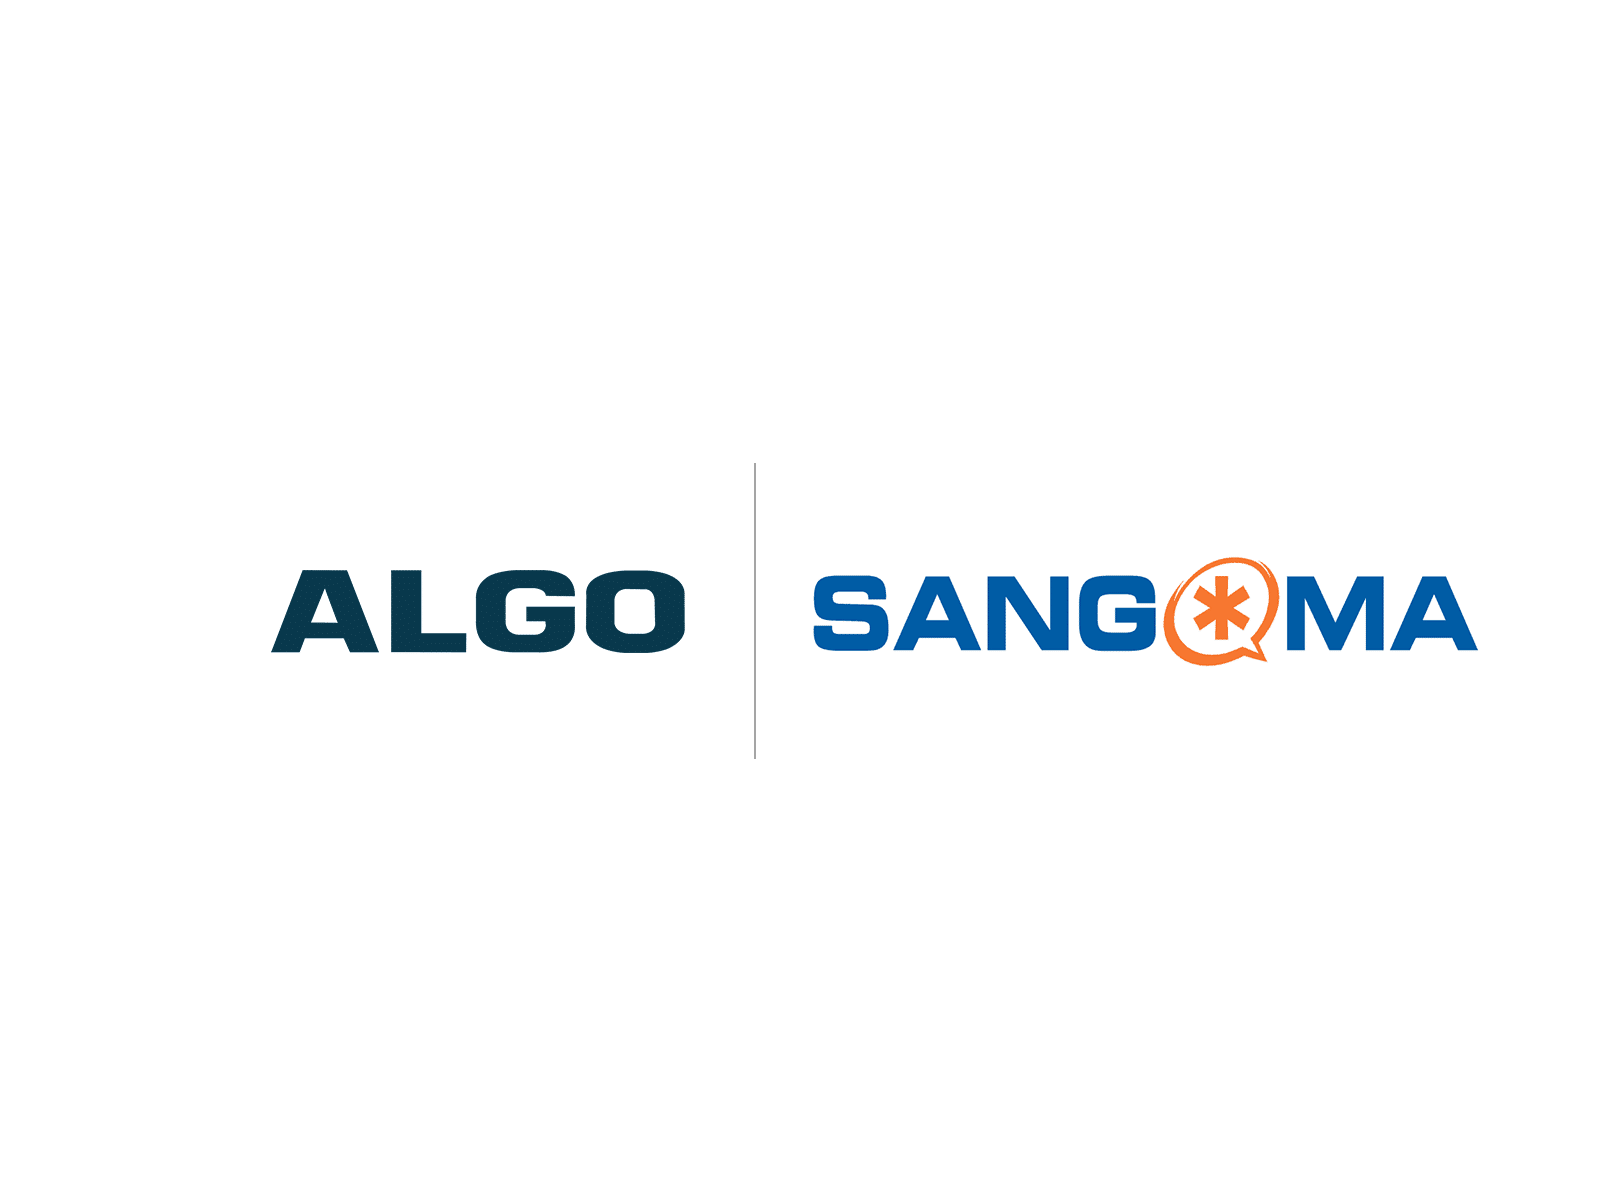 Algo Sangoma Compatibility Logo